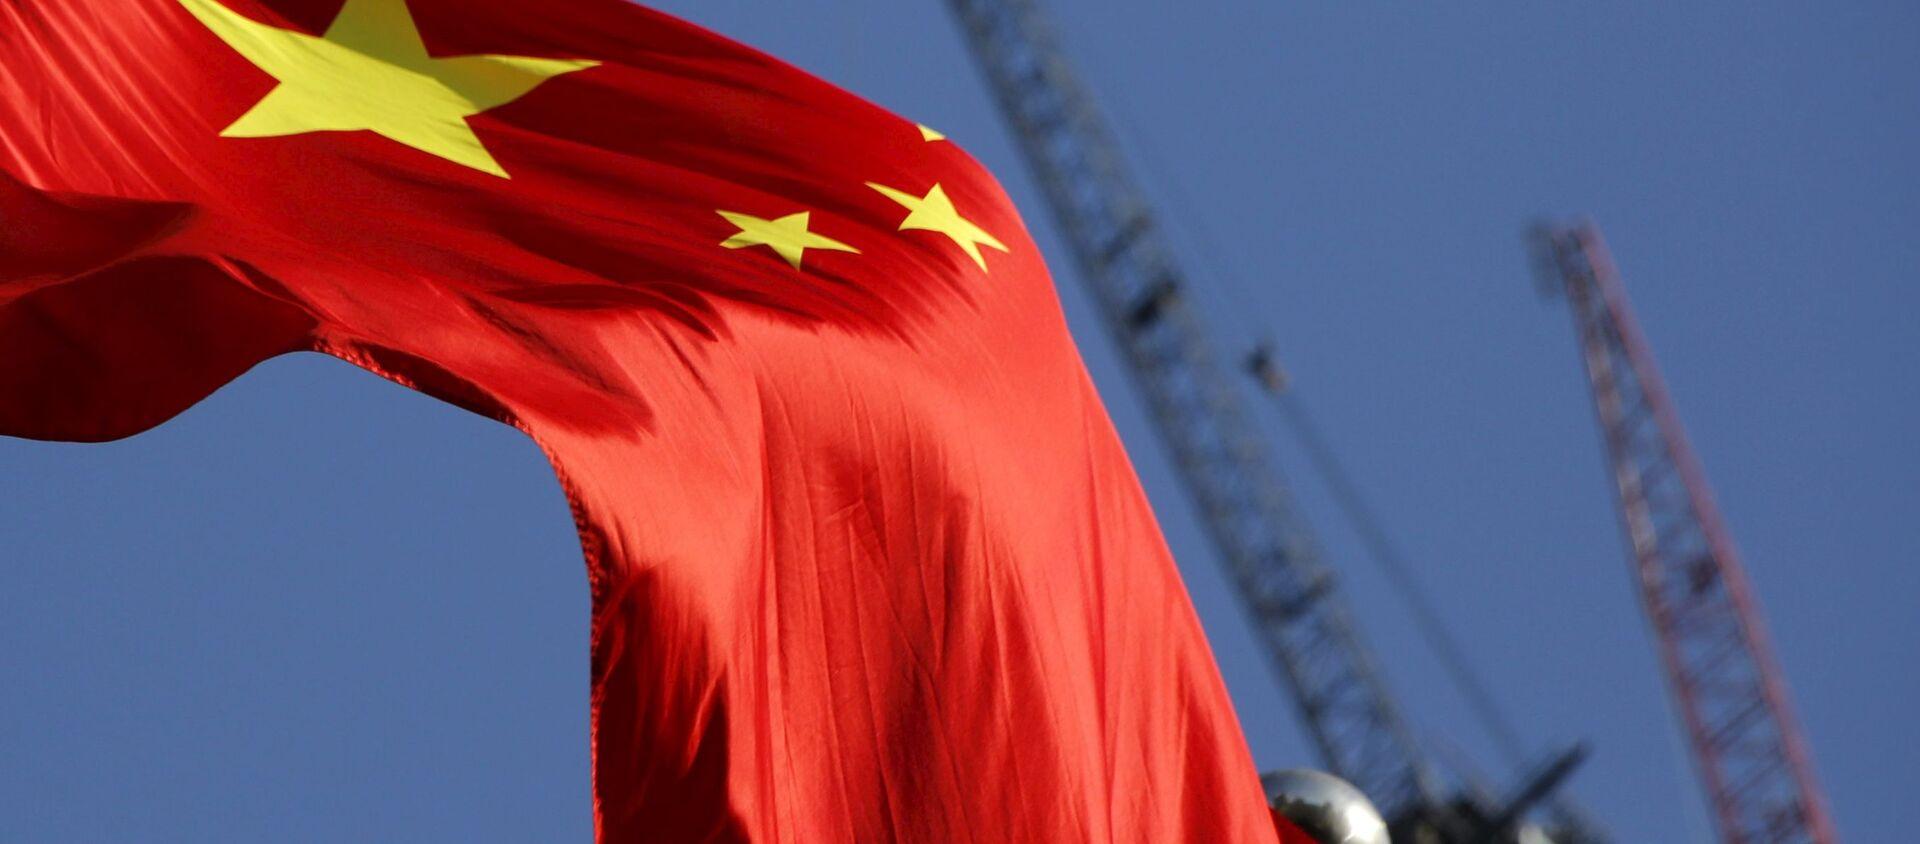 quốc kỳ Trung Quốc - Sputnik Việt Nam, 1920, 18.08.2021